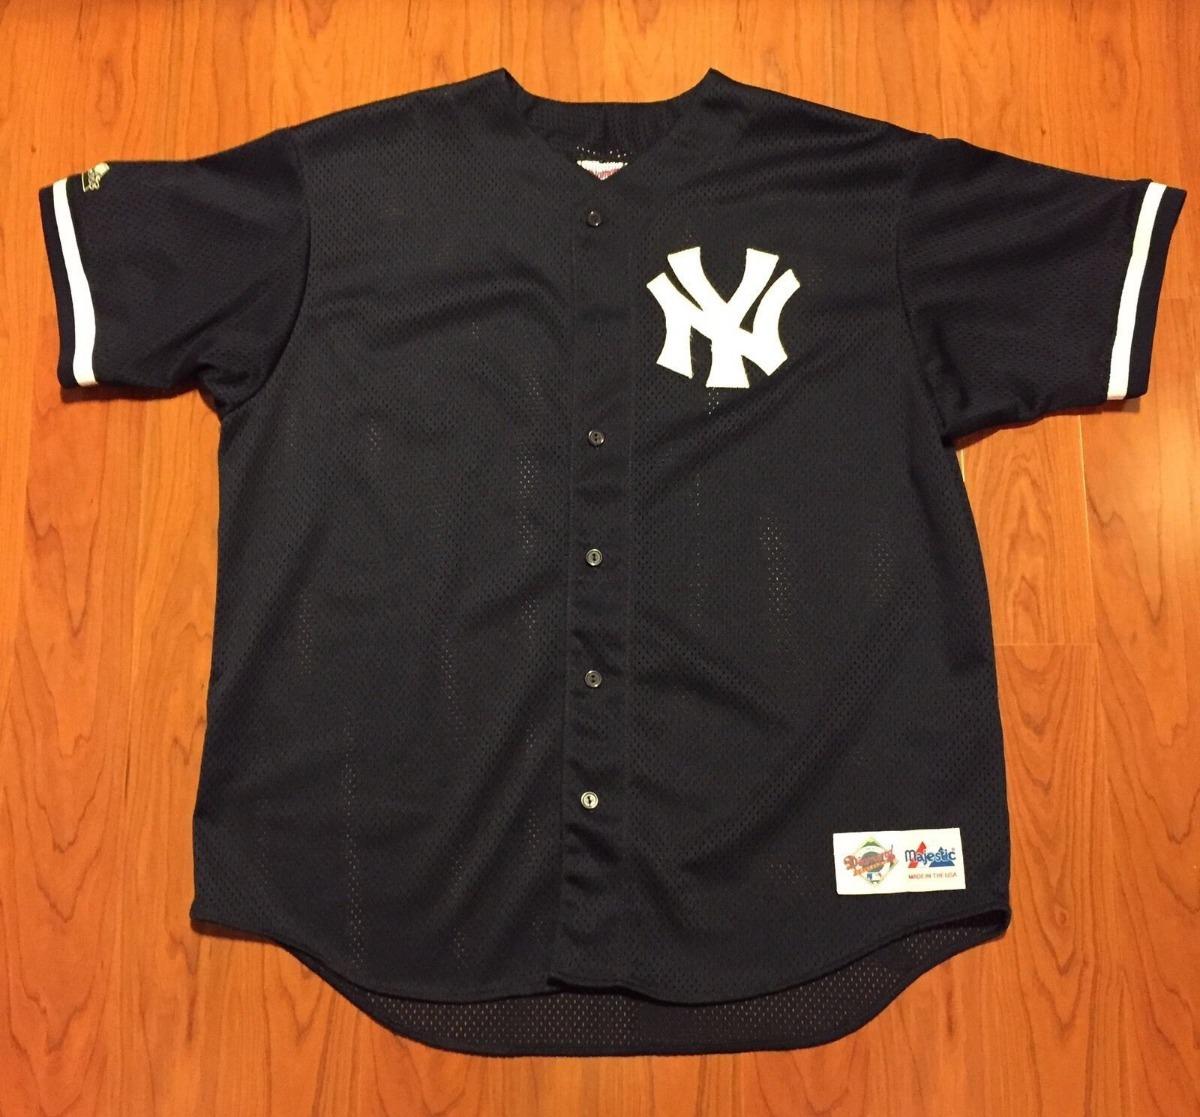 1cc512912e19f Camiseta Beisbol Baseball Yankees New York Majestic Mets - S  70